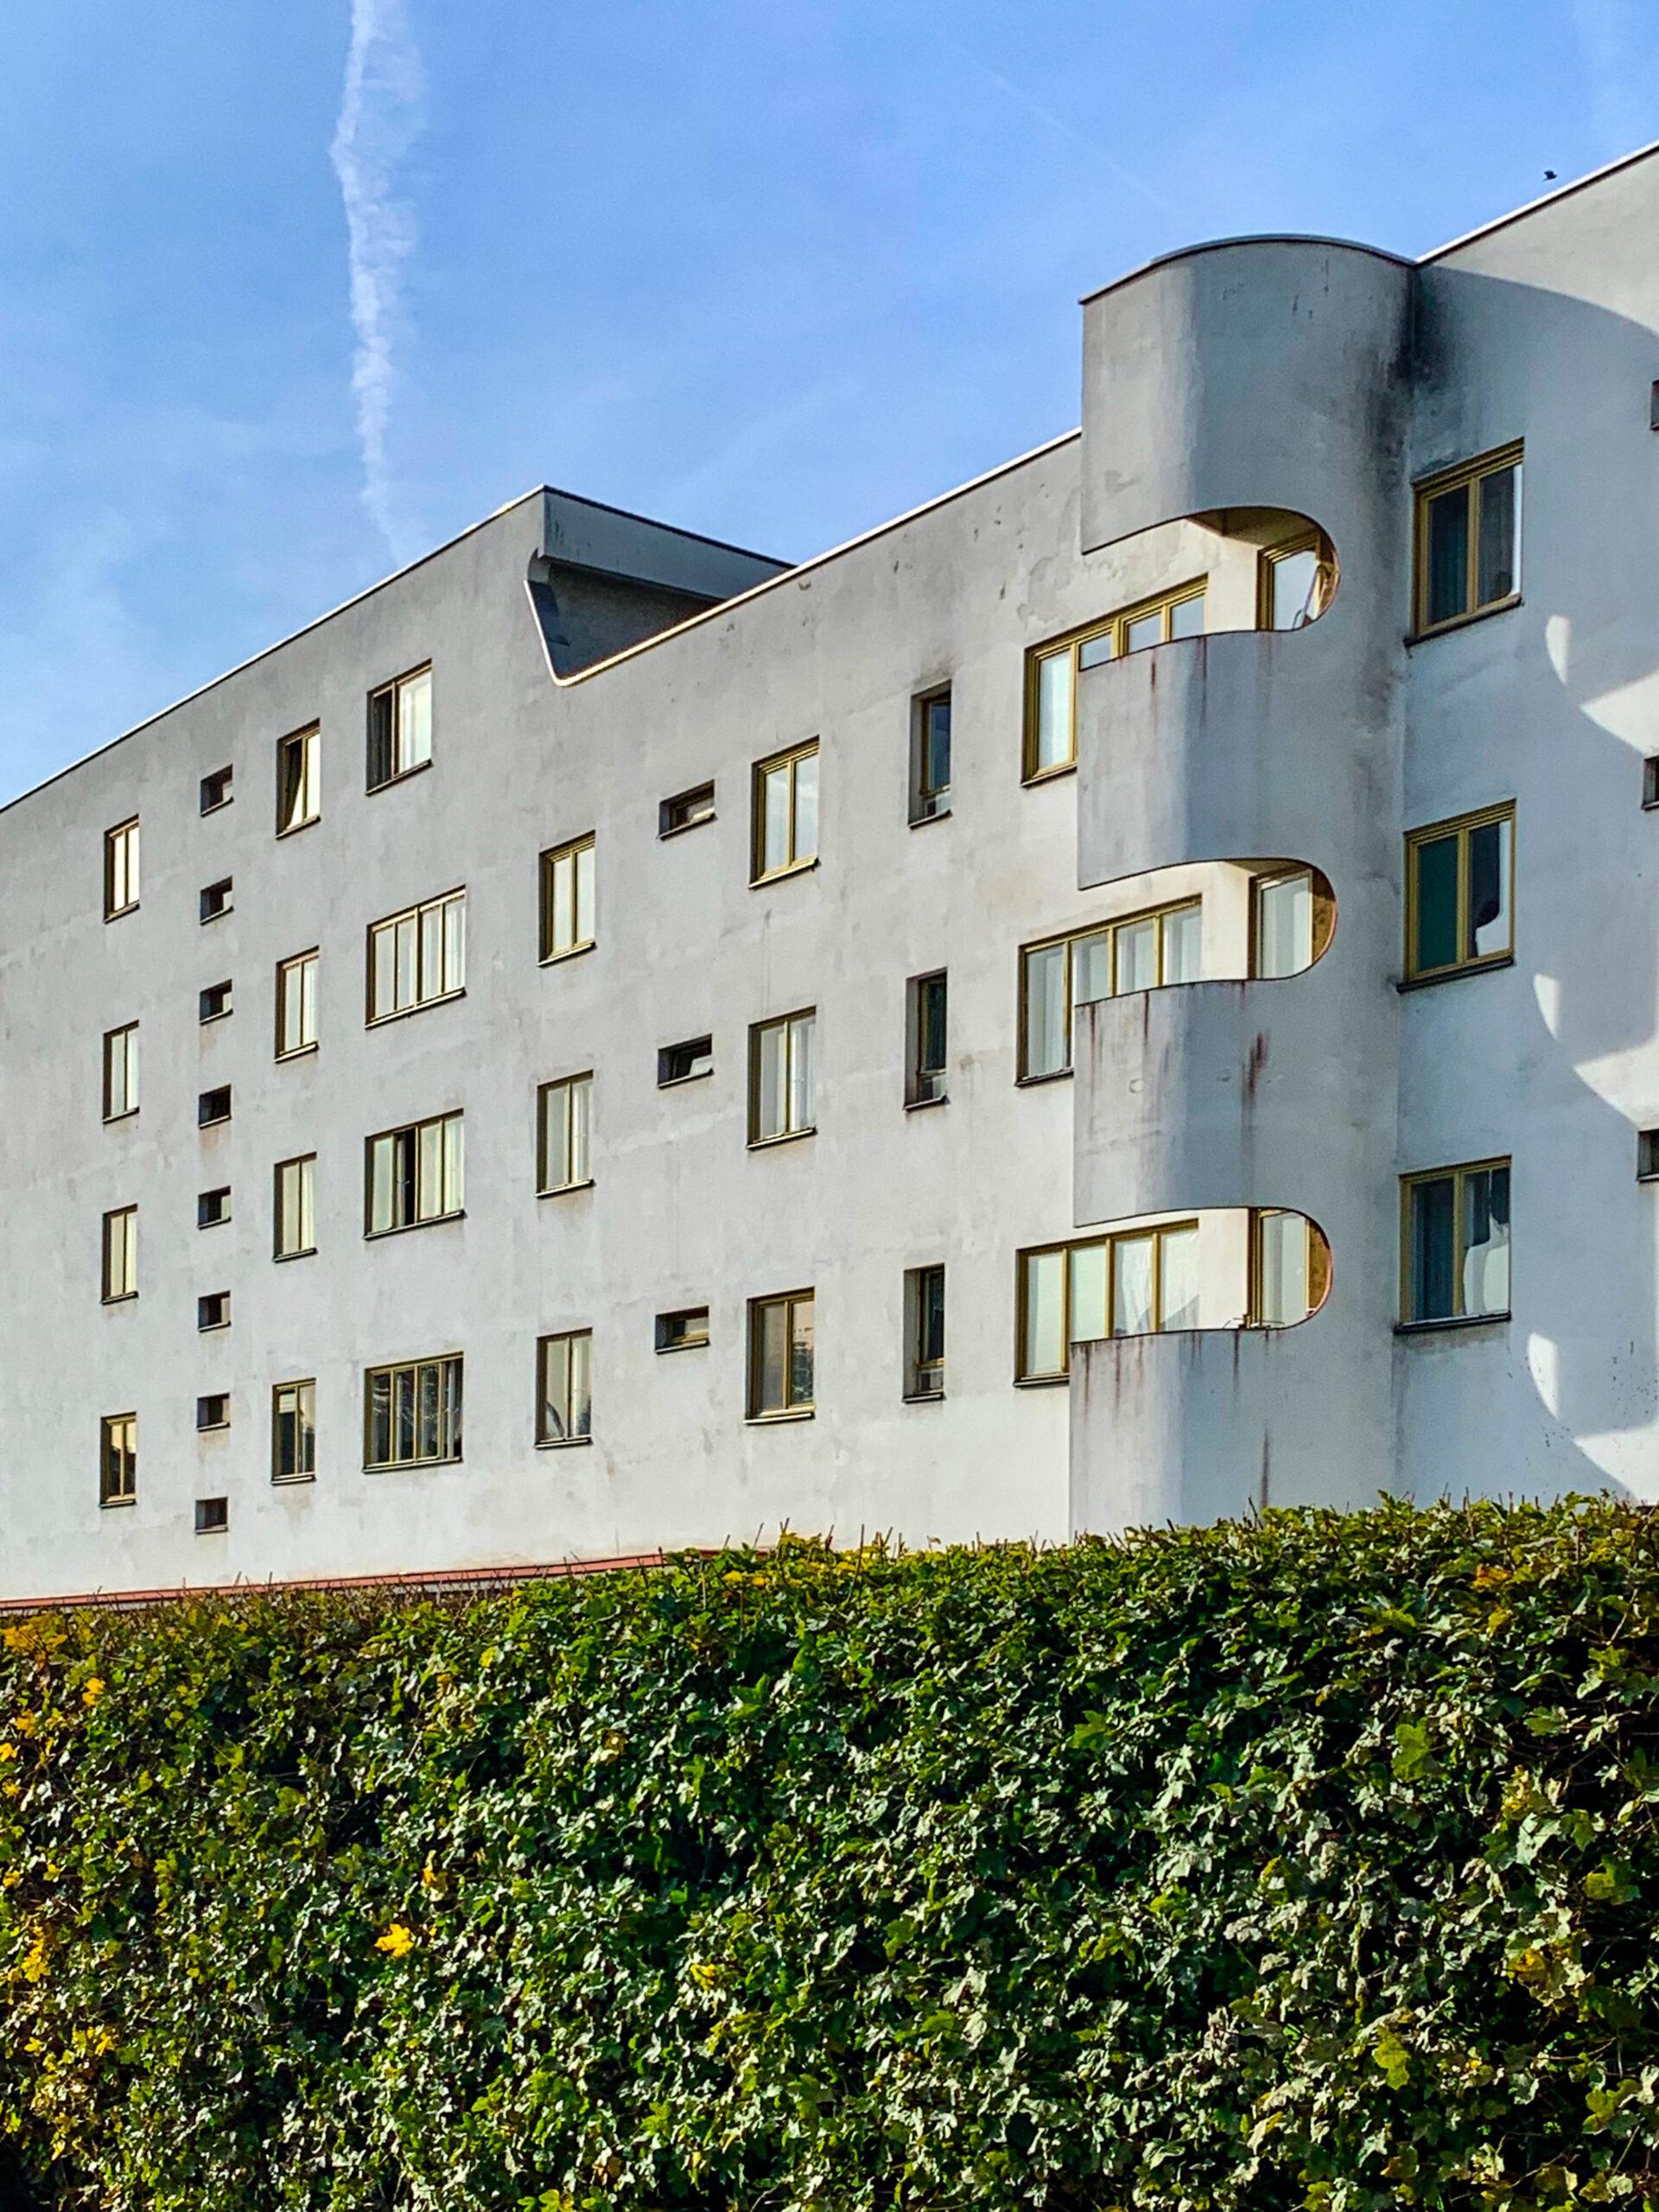 Residential complex Panzerkreuzer, 1929-1930. Architect: Hans Scharoun